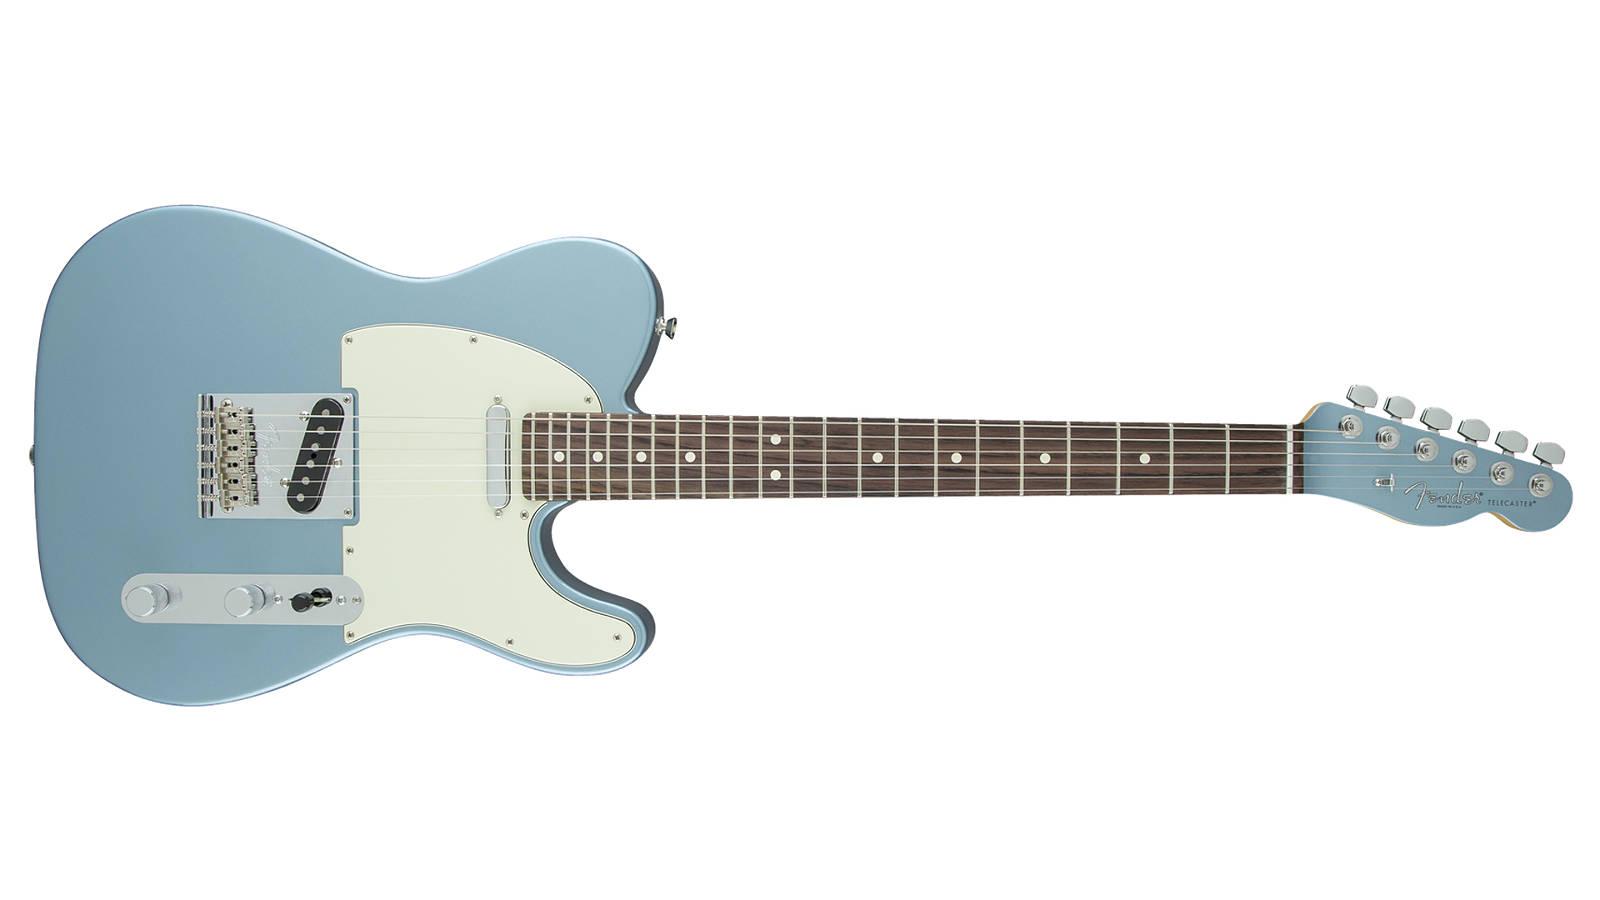 Fender Limited American Standard Telecaster IBM